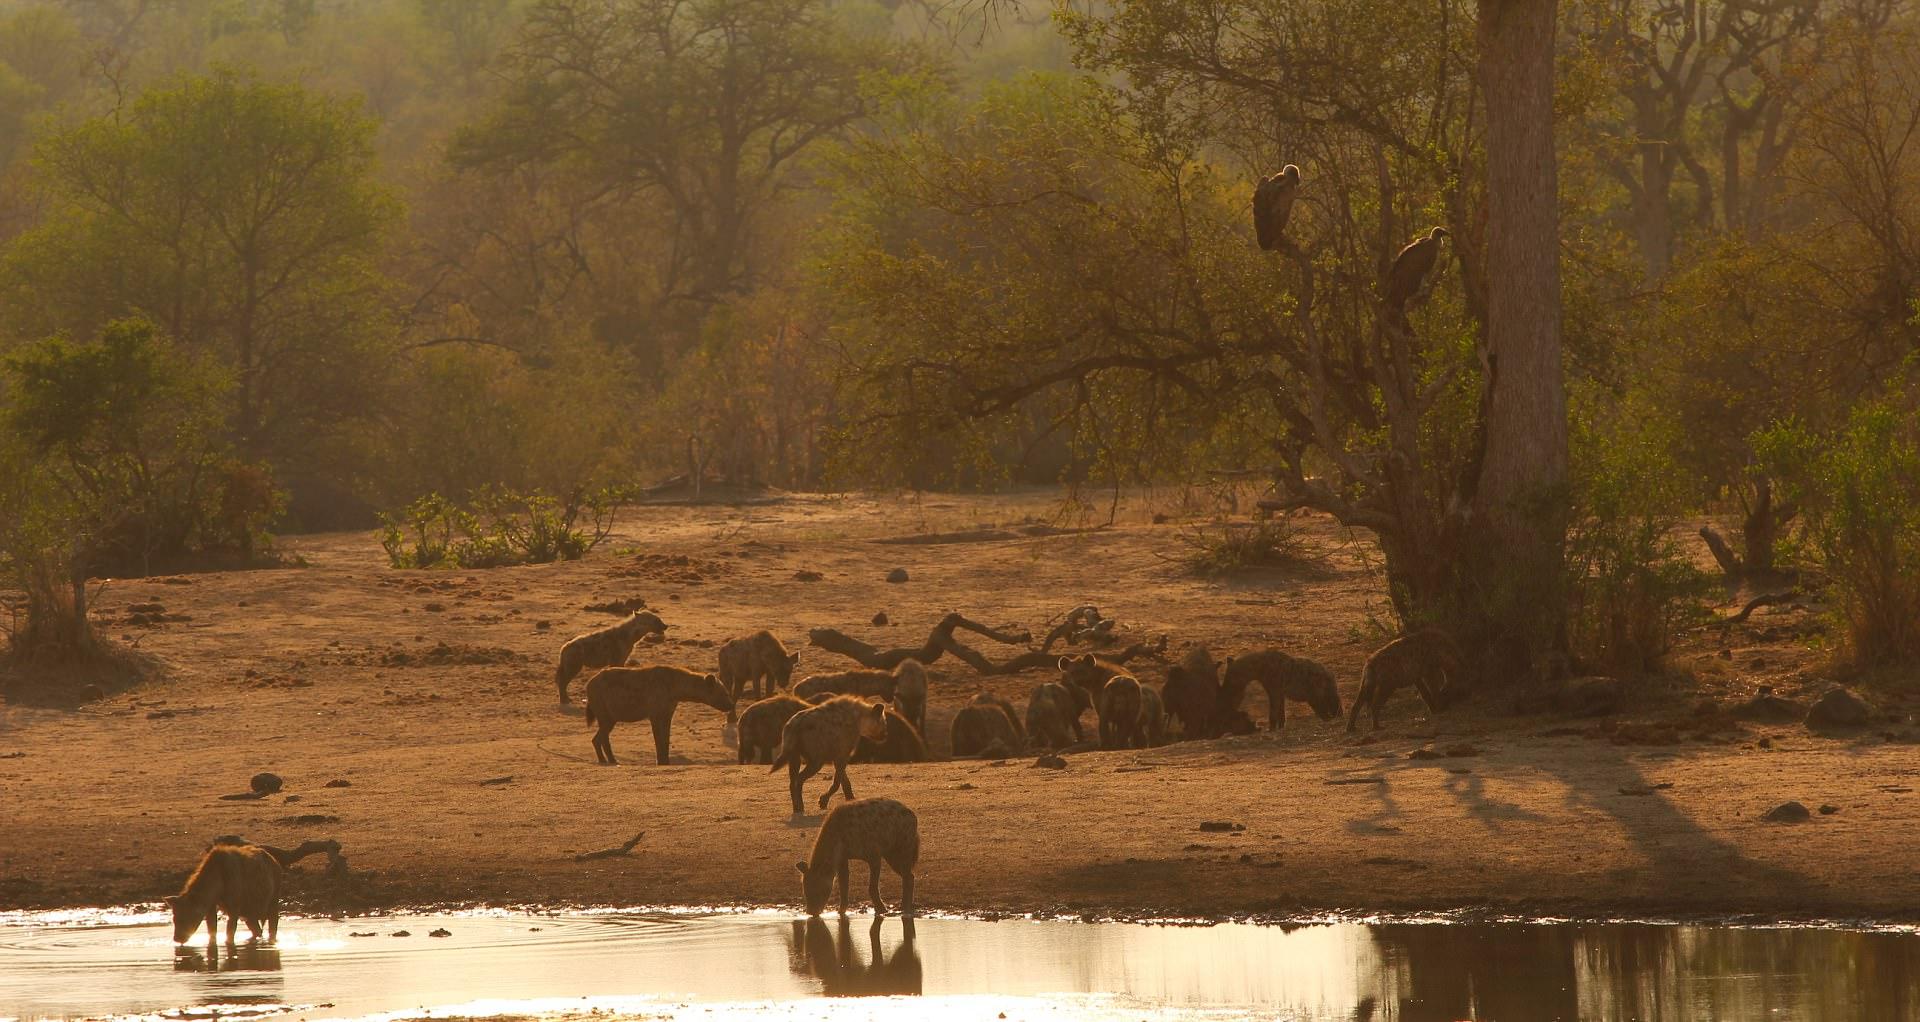 Tanda Tula, Kruger National Park